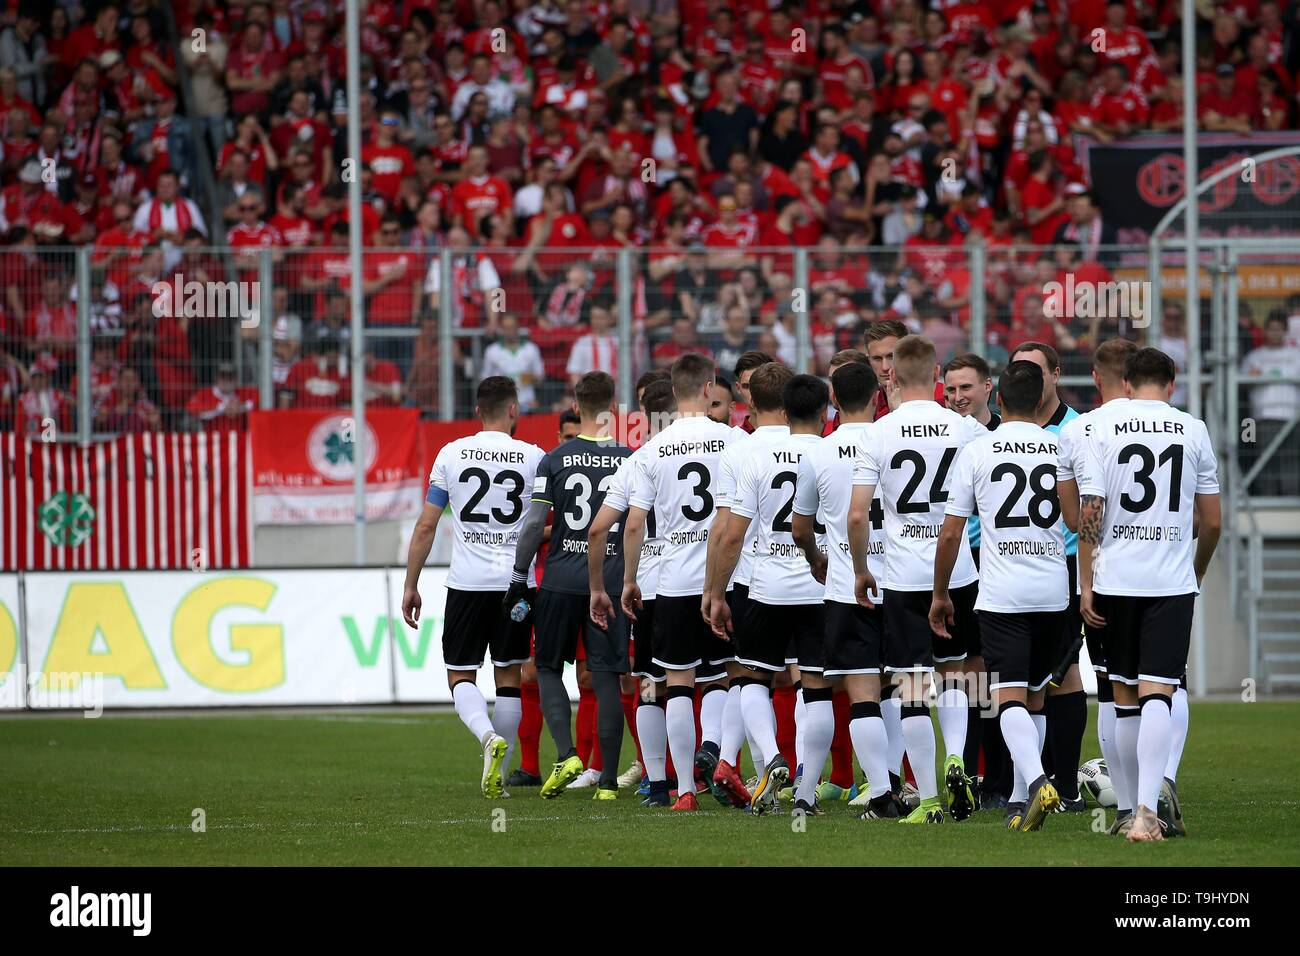 Oberhausen, Germany. 18th May, 2019. firo: 18.05.2019 Football, Regionalliga West, season 2018/2019 Rot-Weiss Oberhausen - SC Verl The teams clap. | usage worldwide Credit: dpa/Alamy Live News - Stock Image